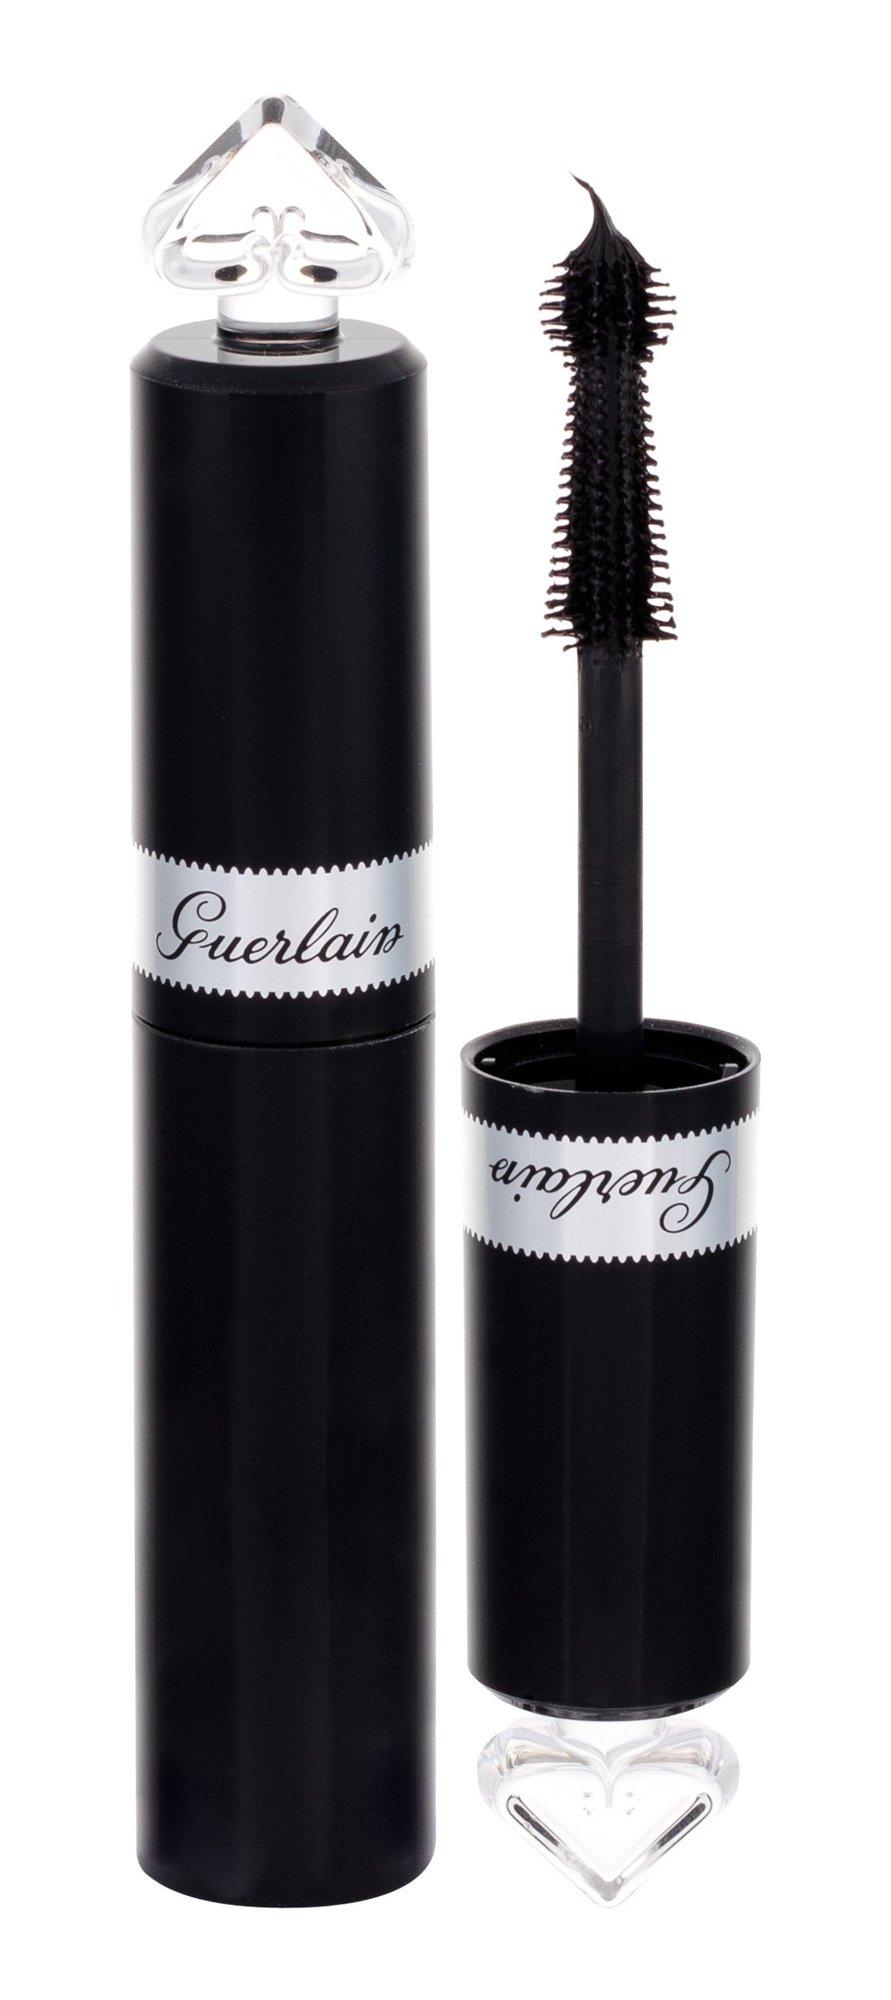 Guerlain La Petite Robe Noire Cosmetic 10ml 01 Black